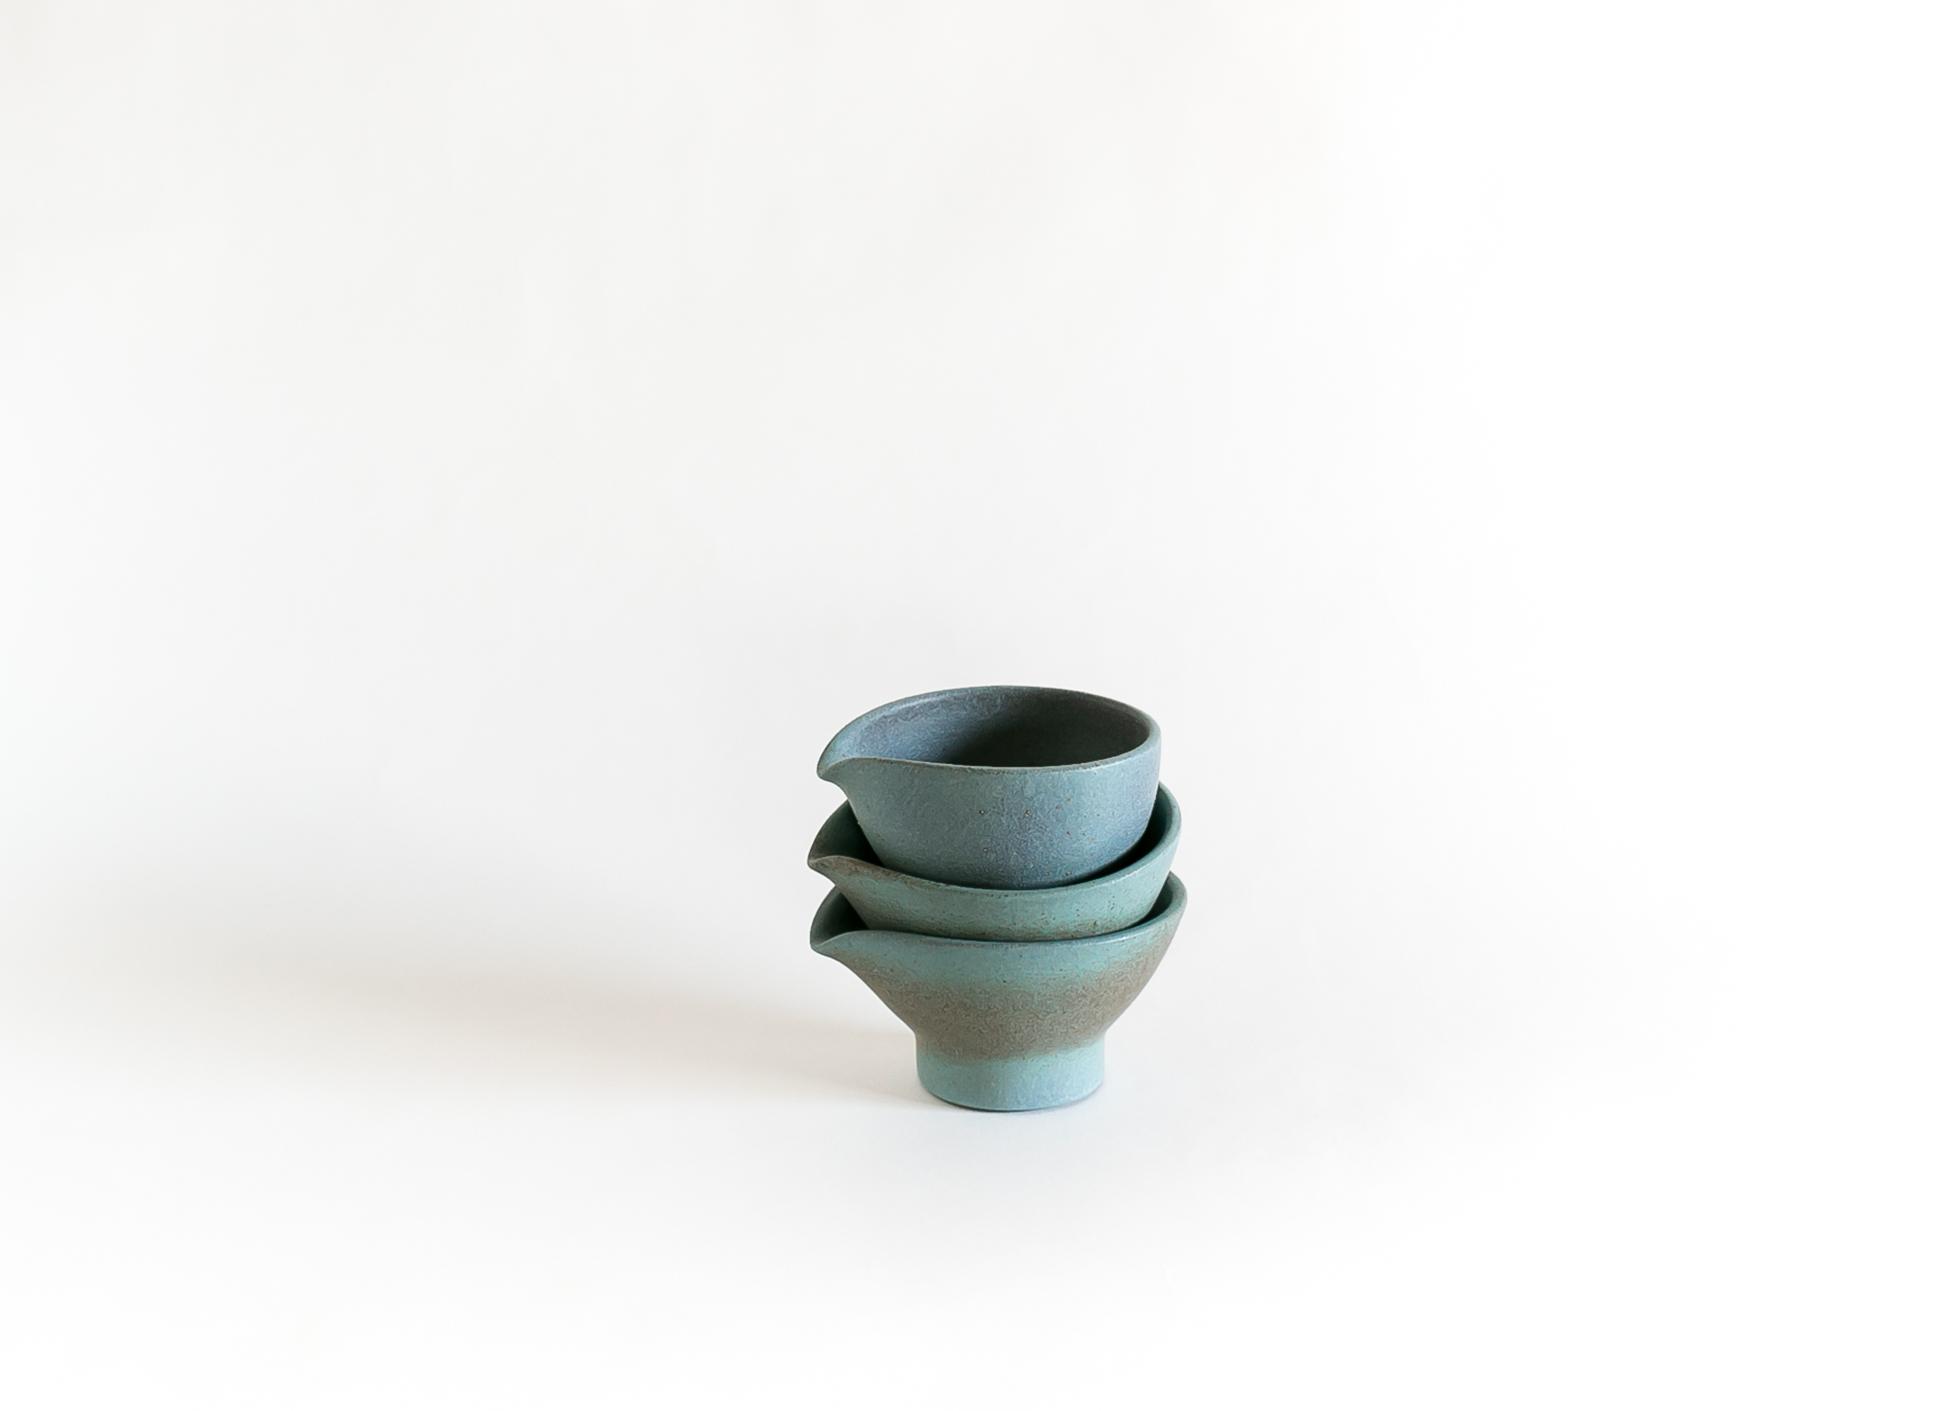 b3_mdba_mdby_ceramics_manufactured_porcelain_mushimegane_books